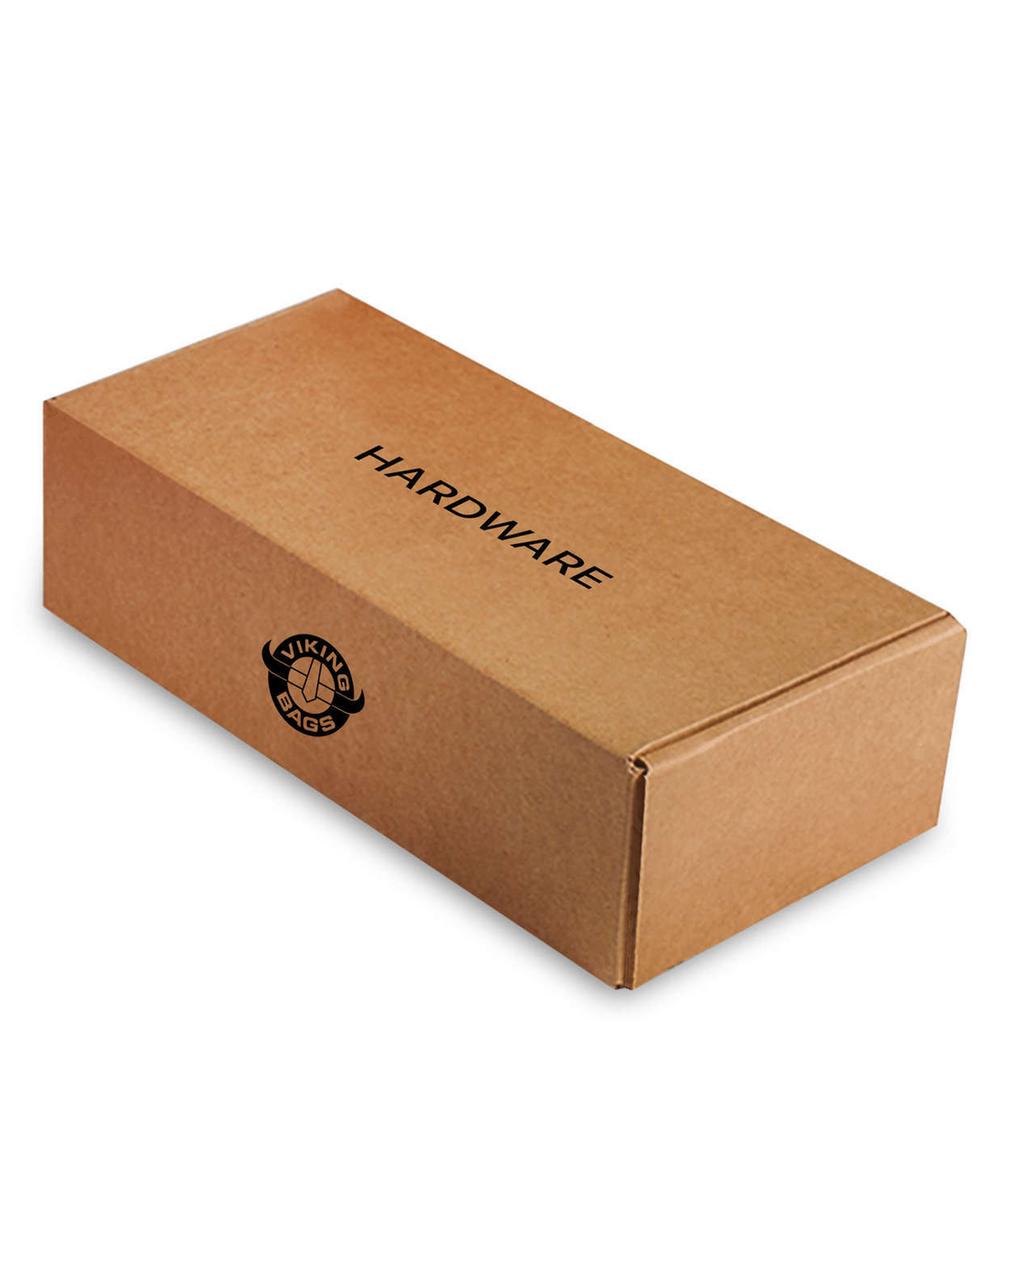 Honda Magna 750 Shock Cutout Motorcycle Saddlebags Hardware Box